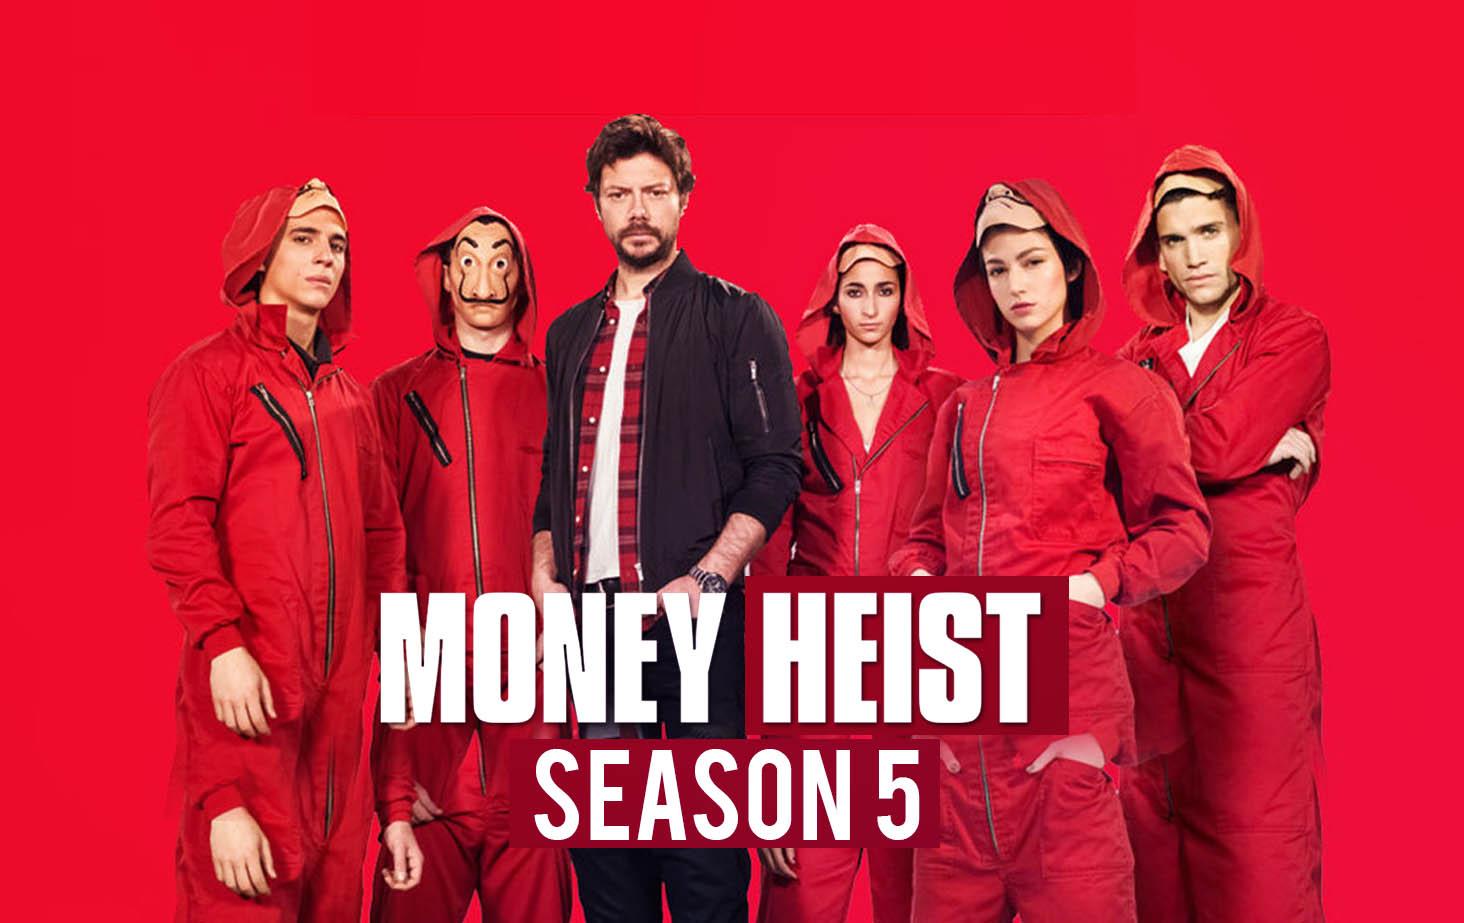 Money Heist Season 5 Vol 1: Release Date, Cast, Trailer, And Spoilers